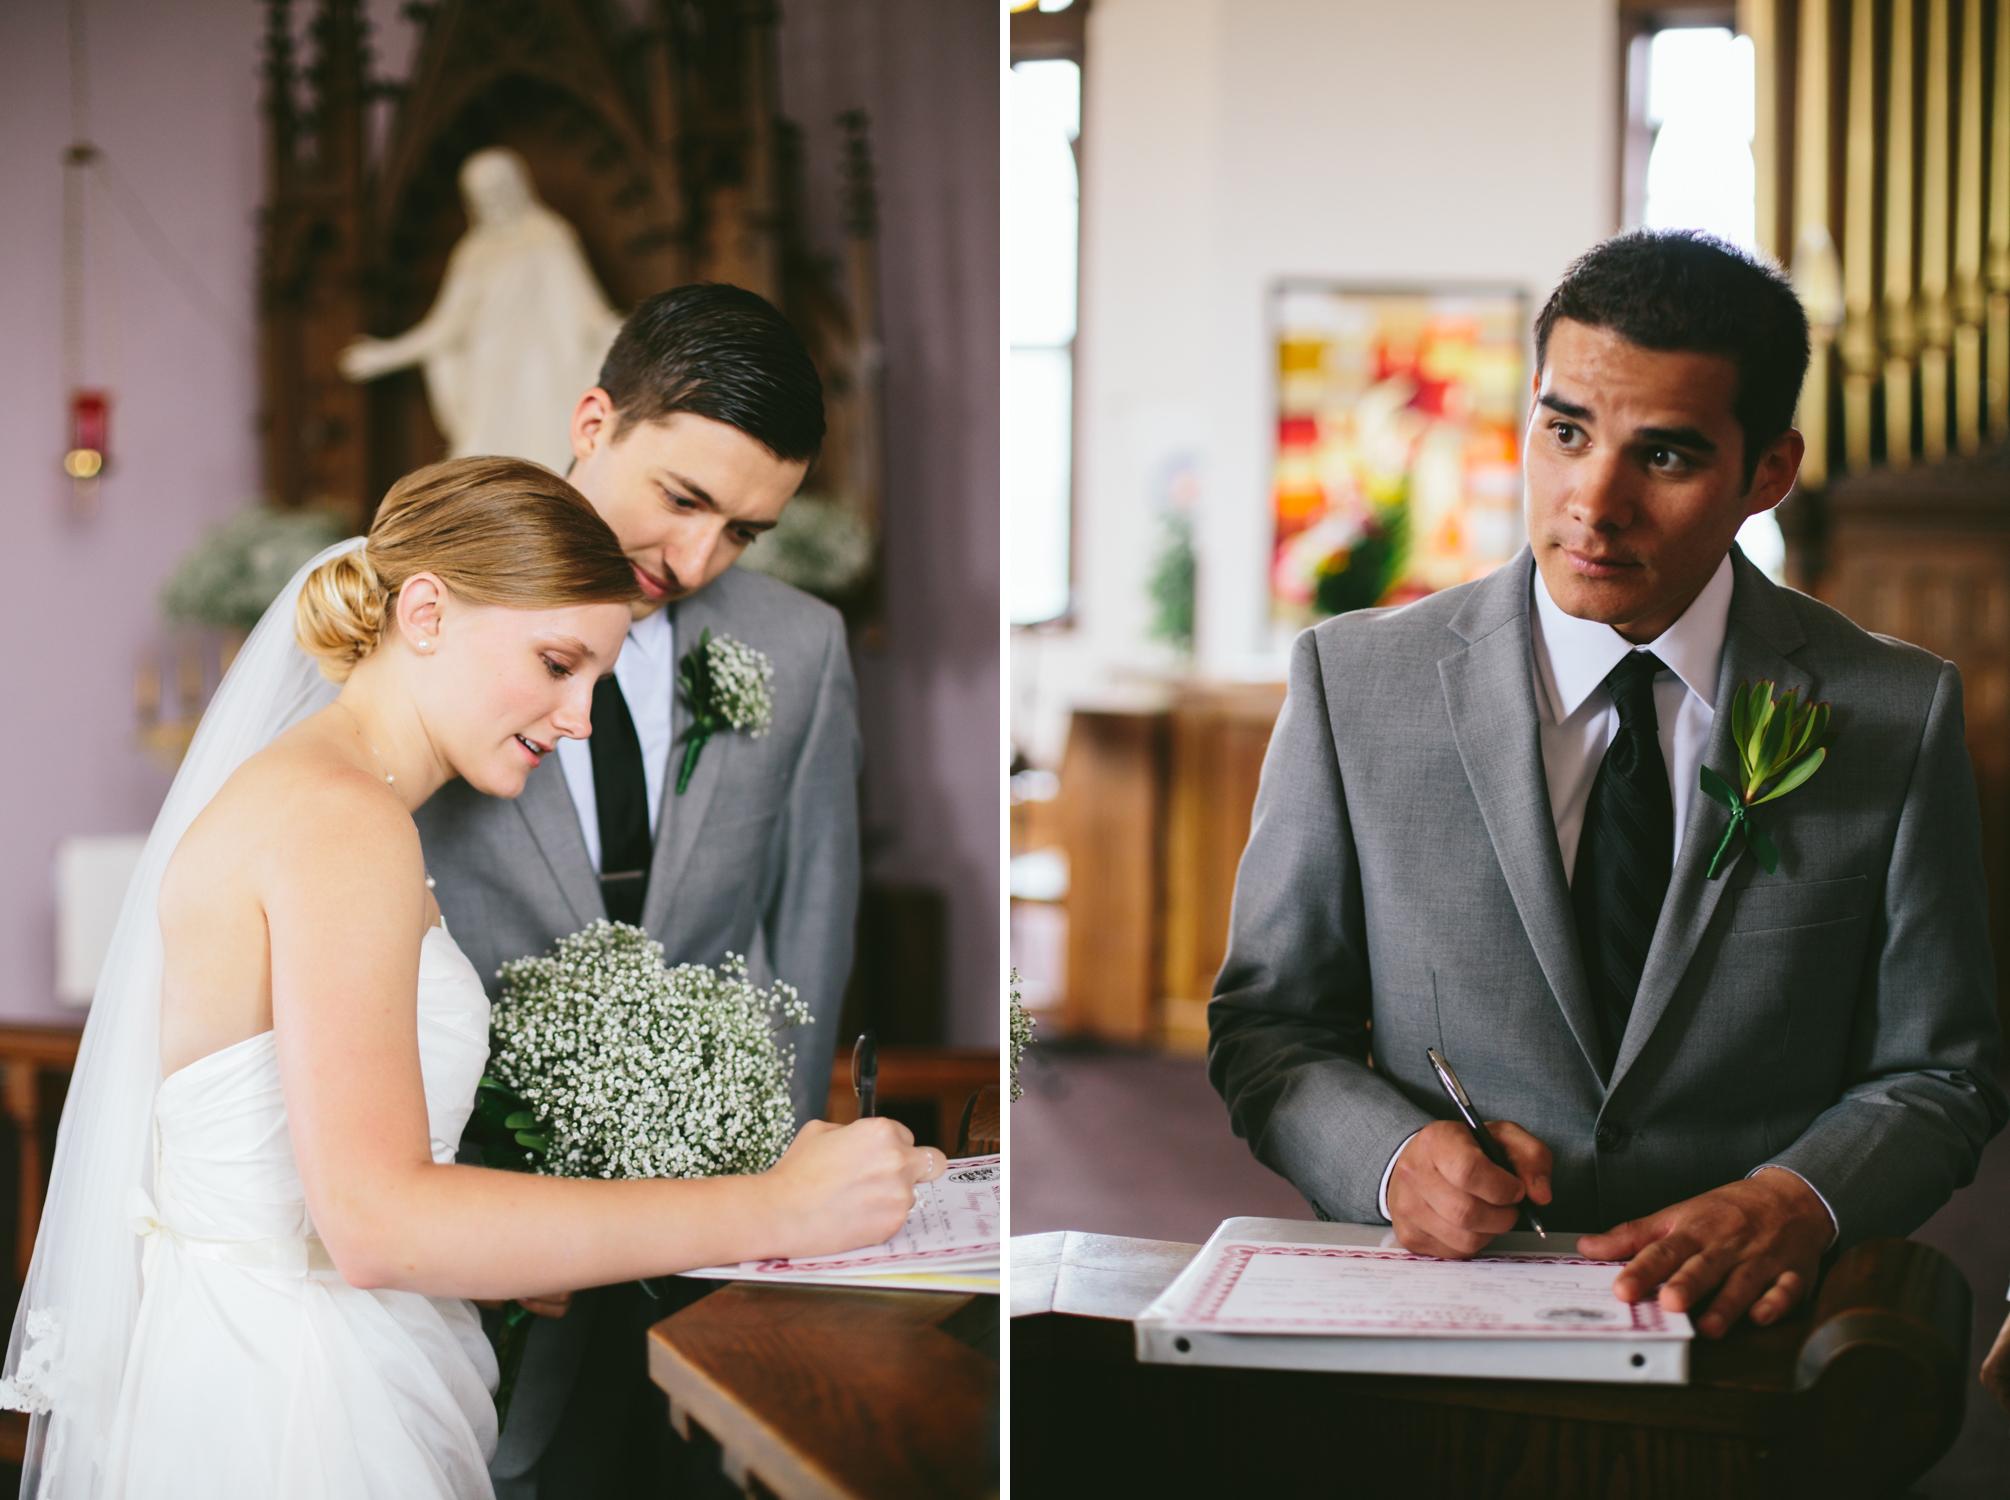 South-Dakota-Intimate-Wedding-30.jpg